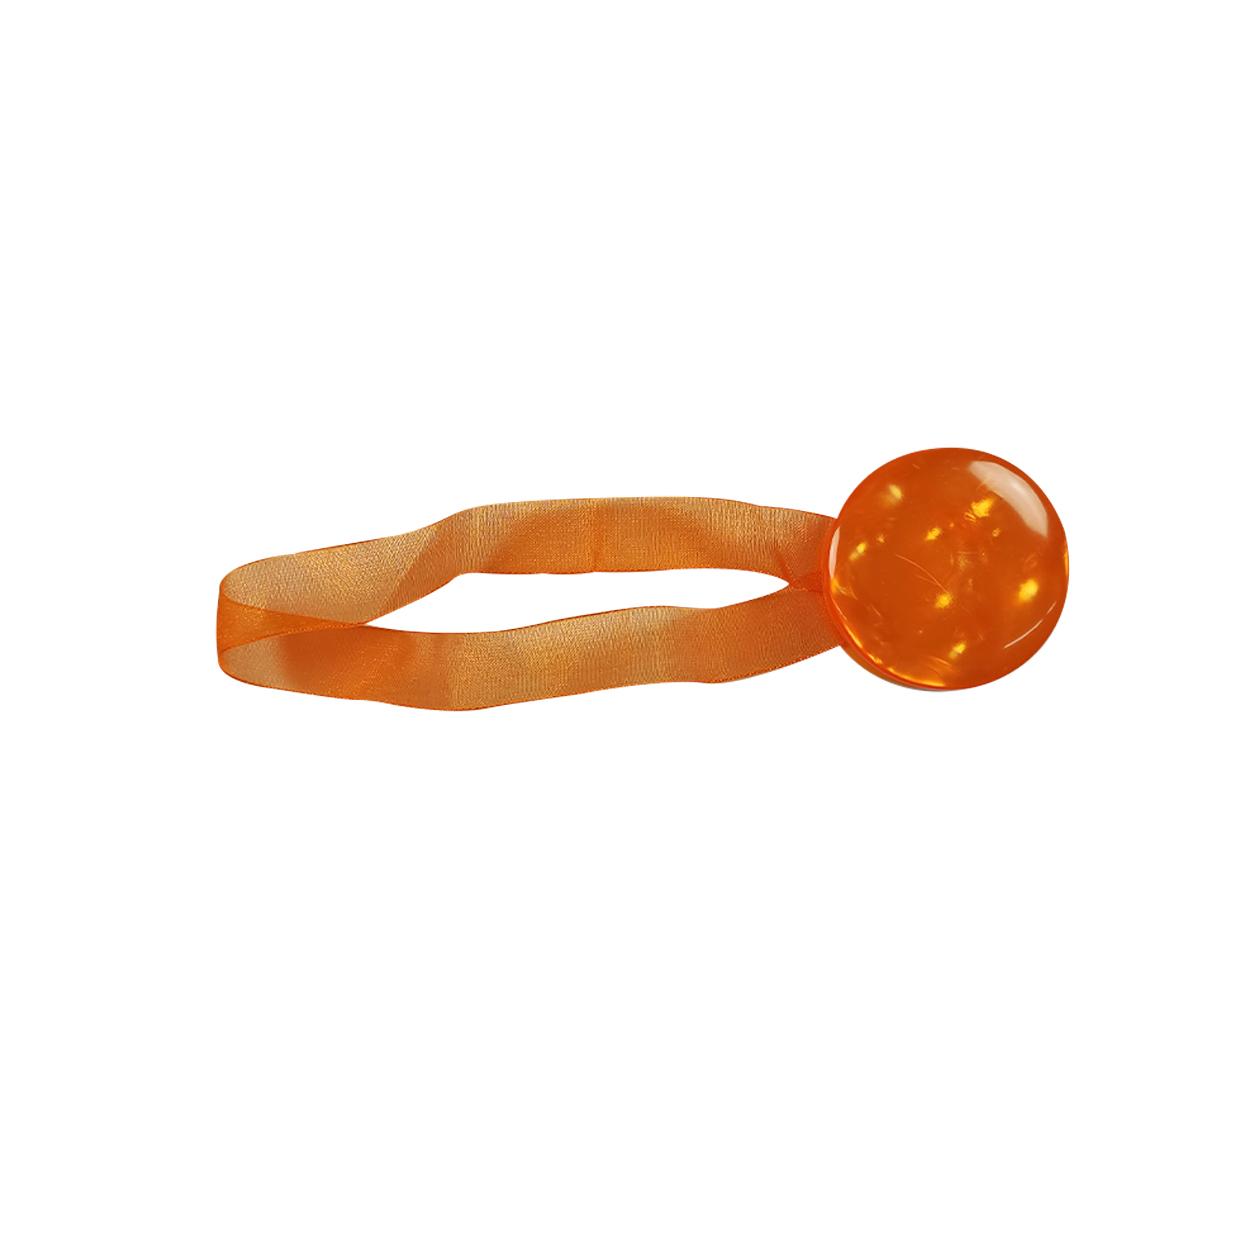 Calamita Tende a Bottone - Arancione